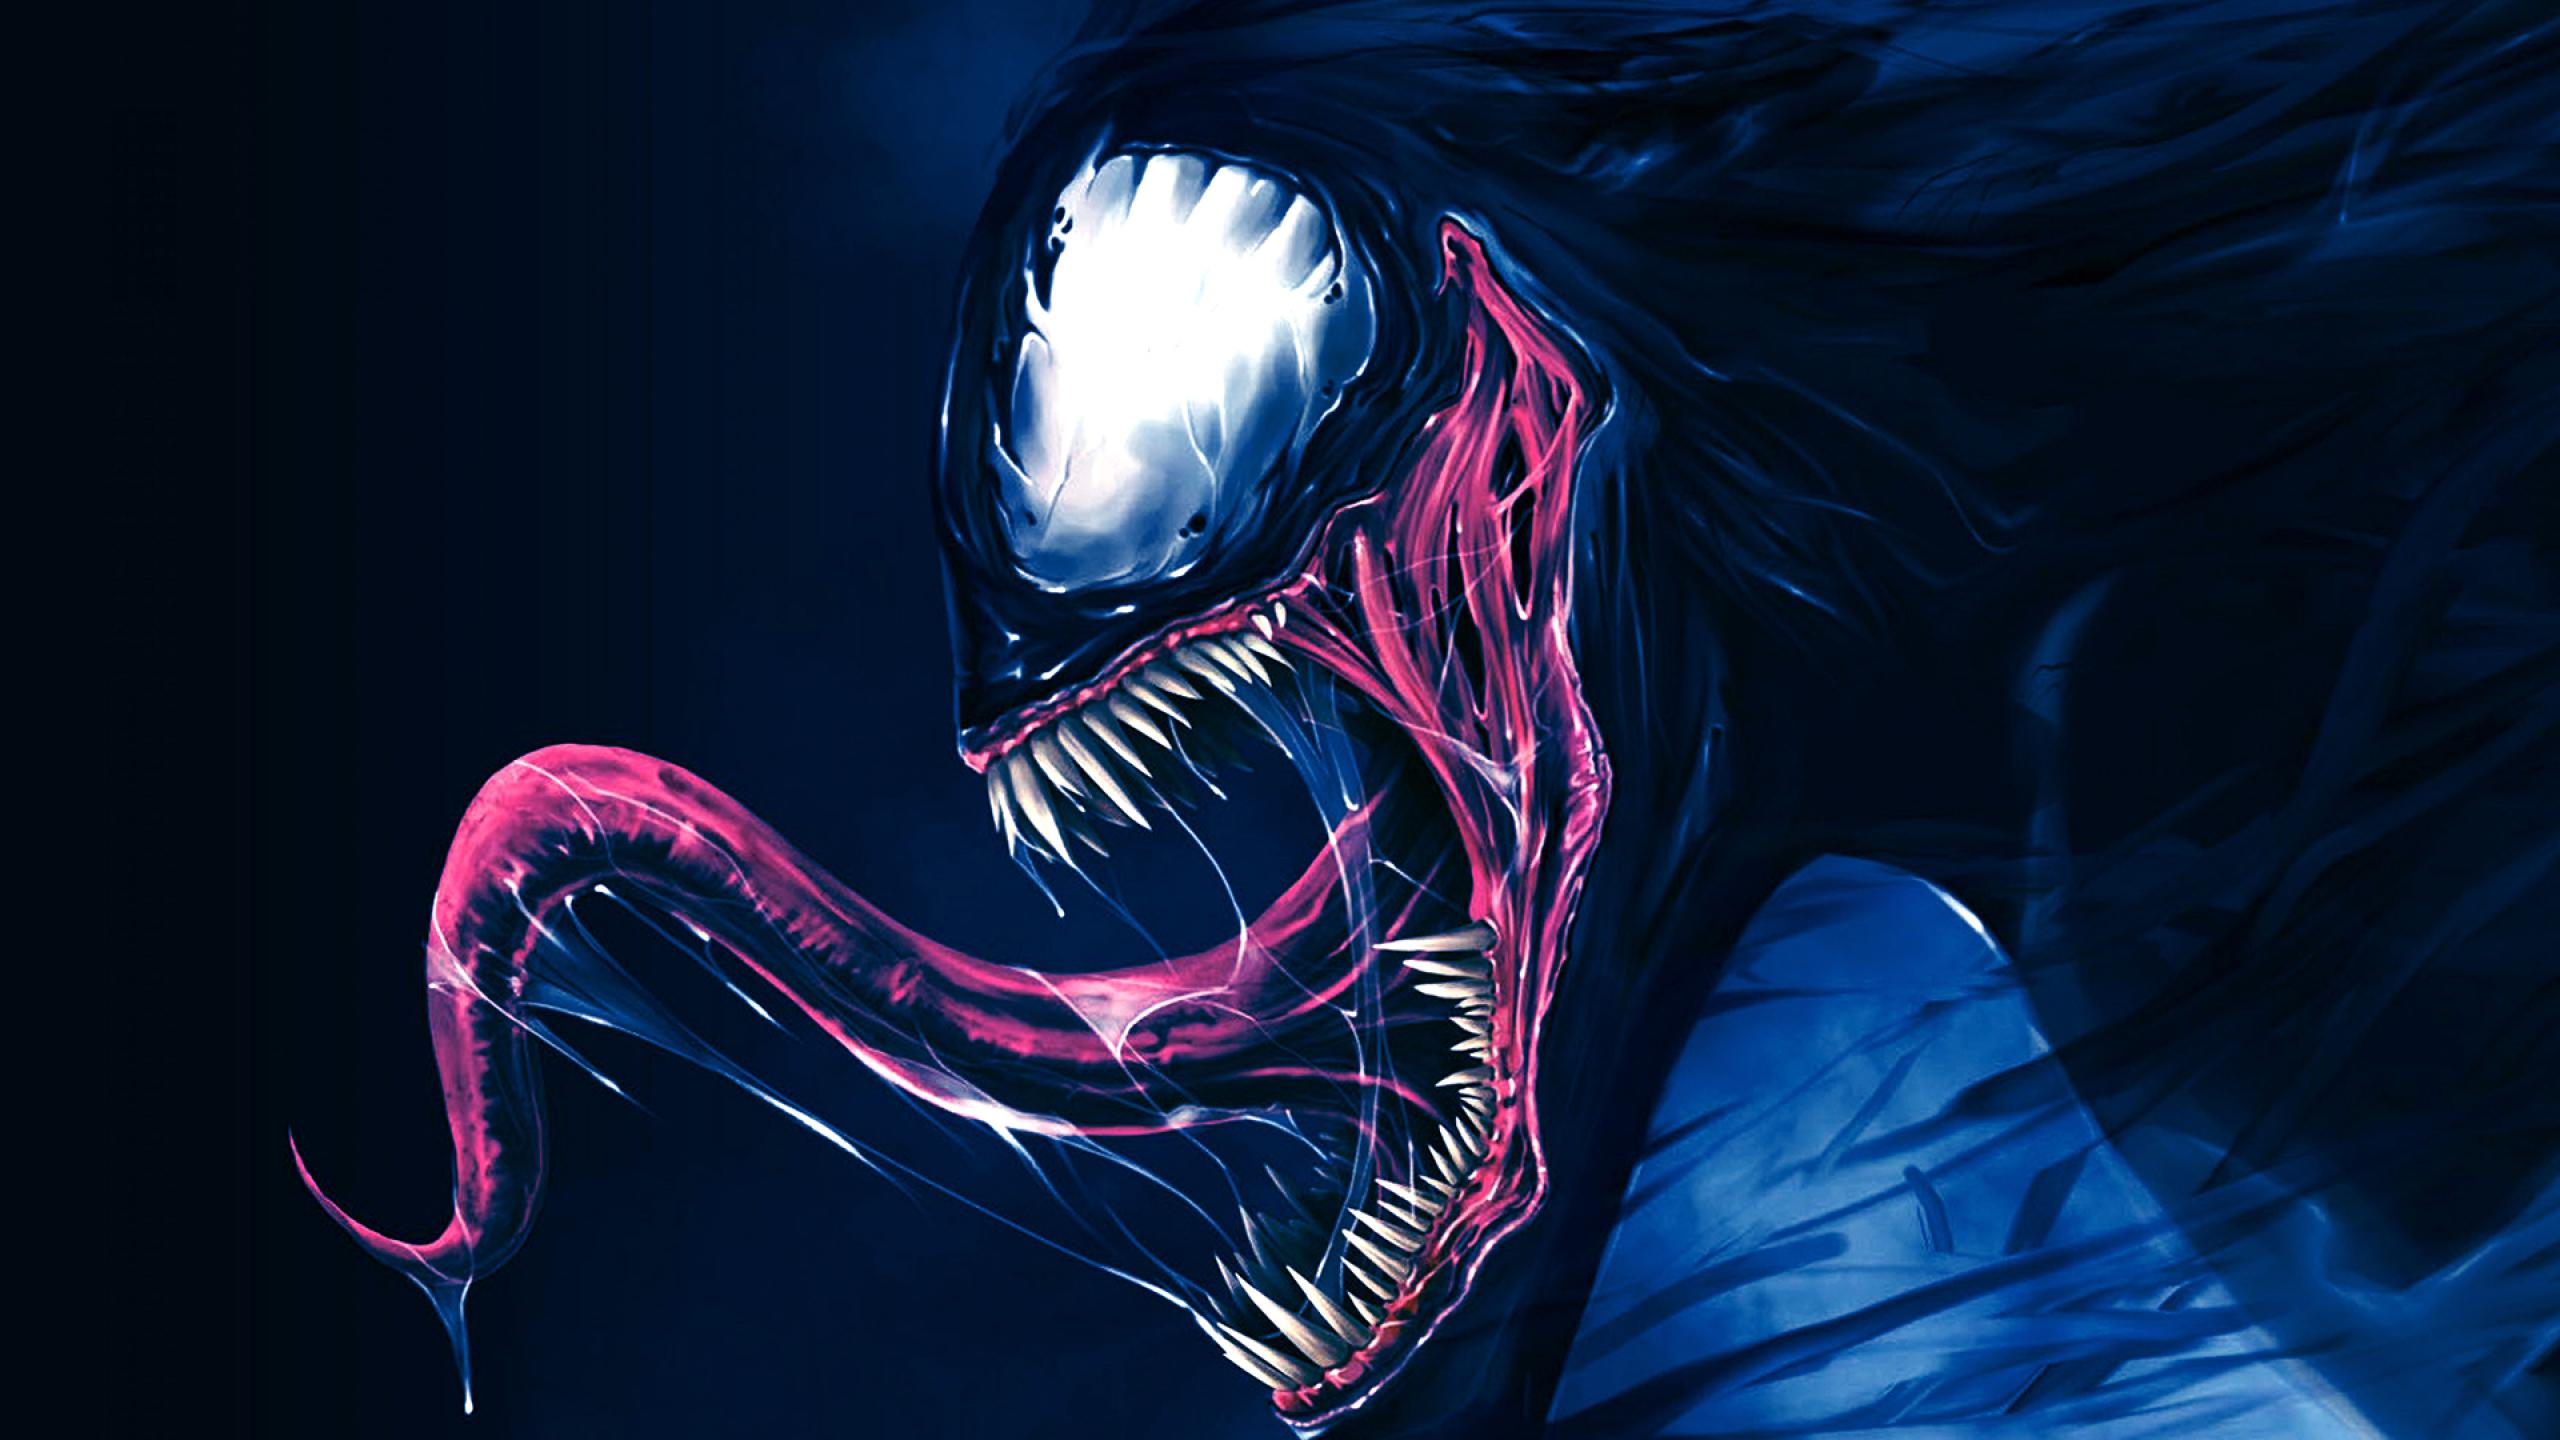 2560x1440 Artwork Venom 1440P Resolution Wallpaper, HD ...